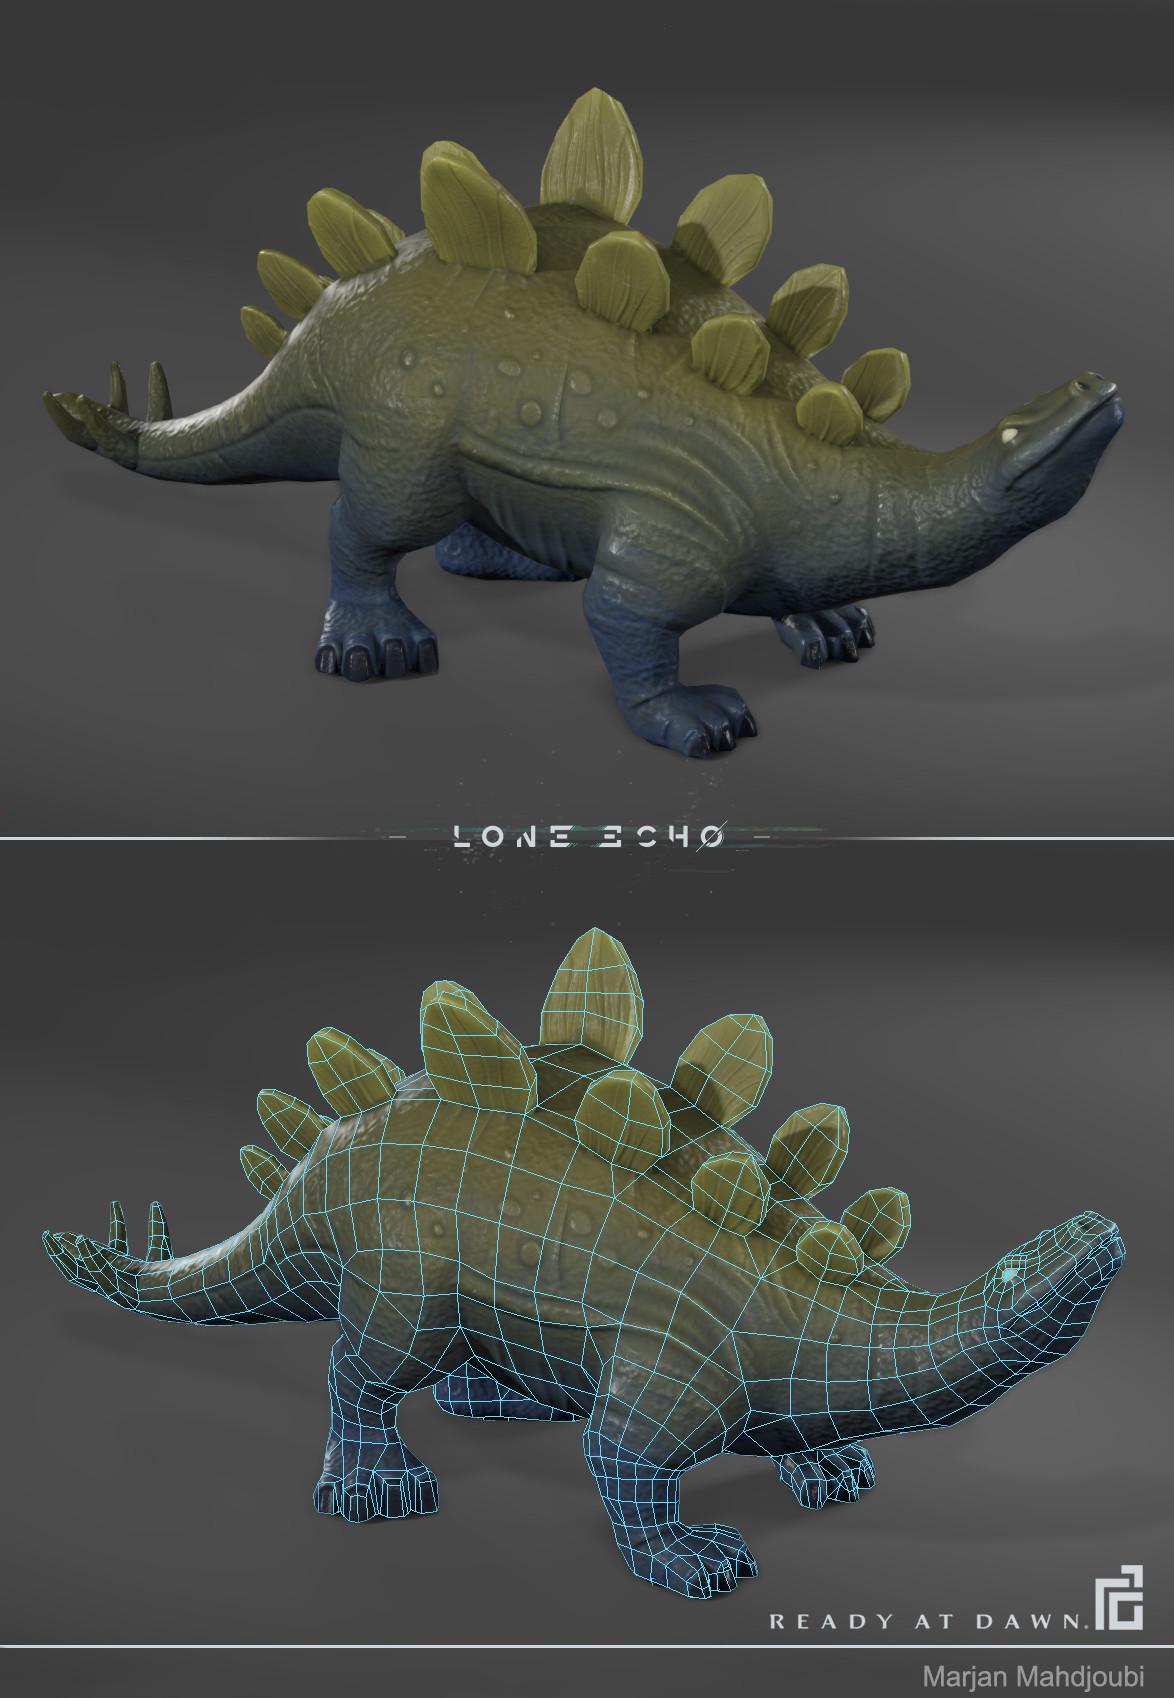 Marjan mahdjoubi stegosaurus ingame